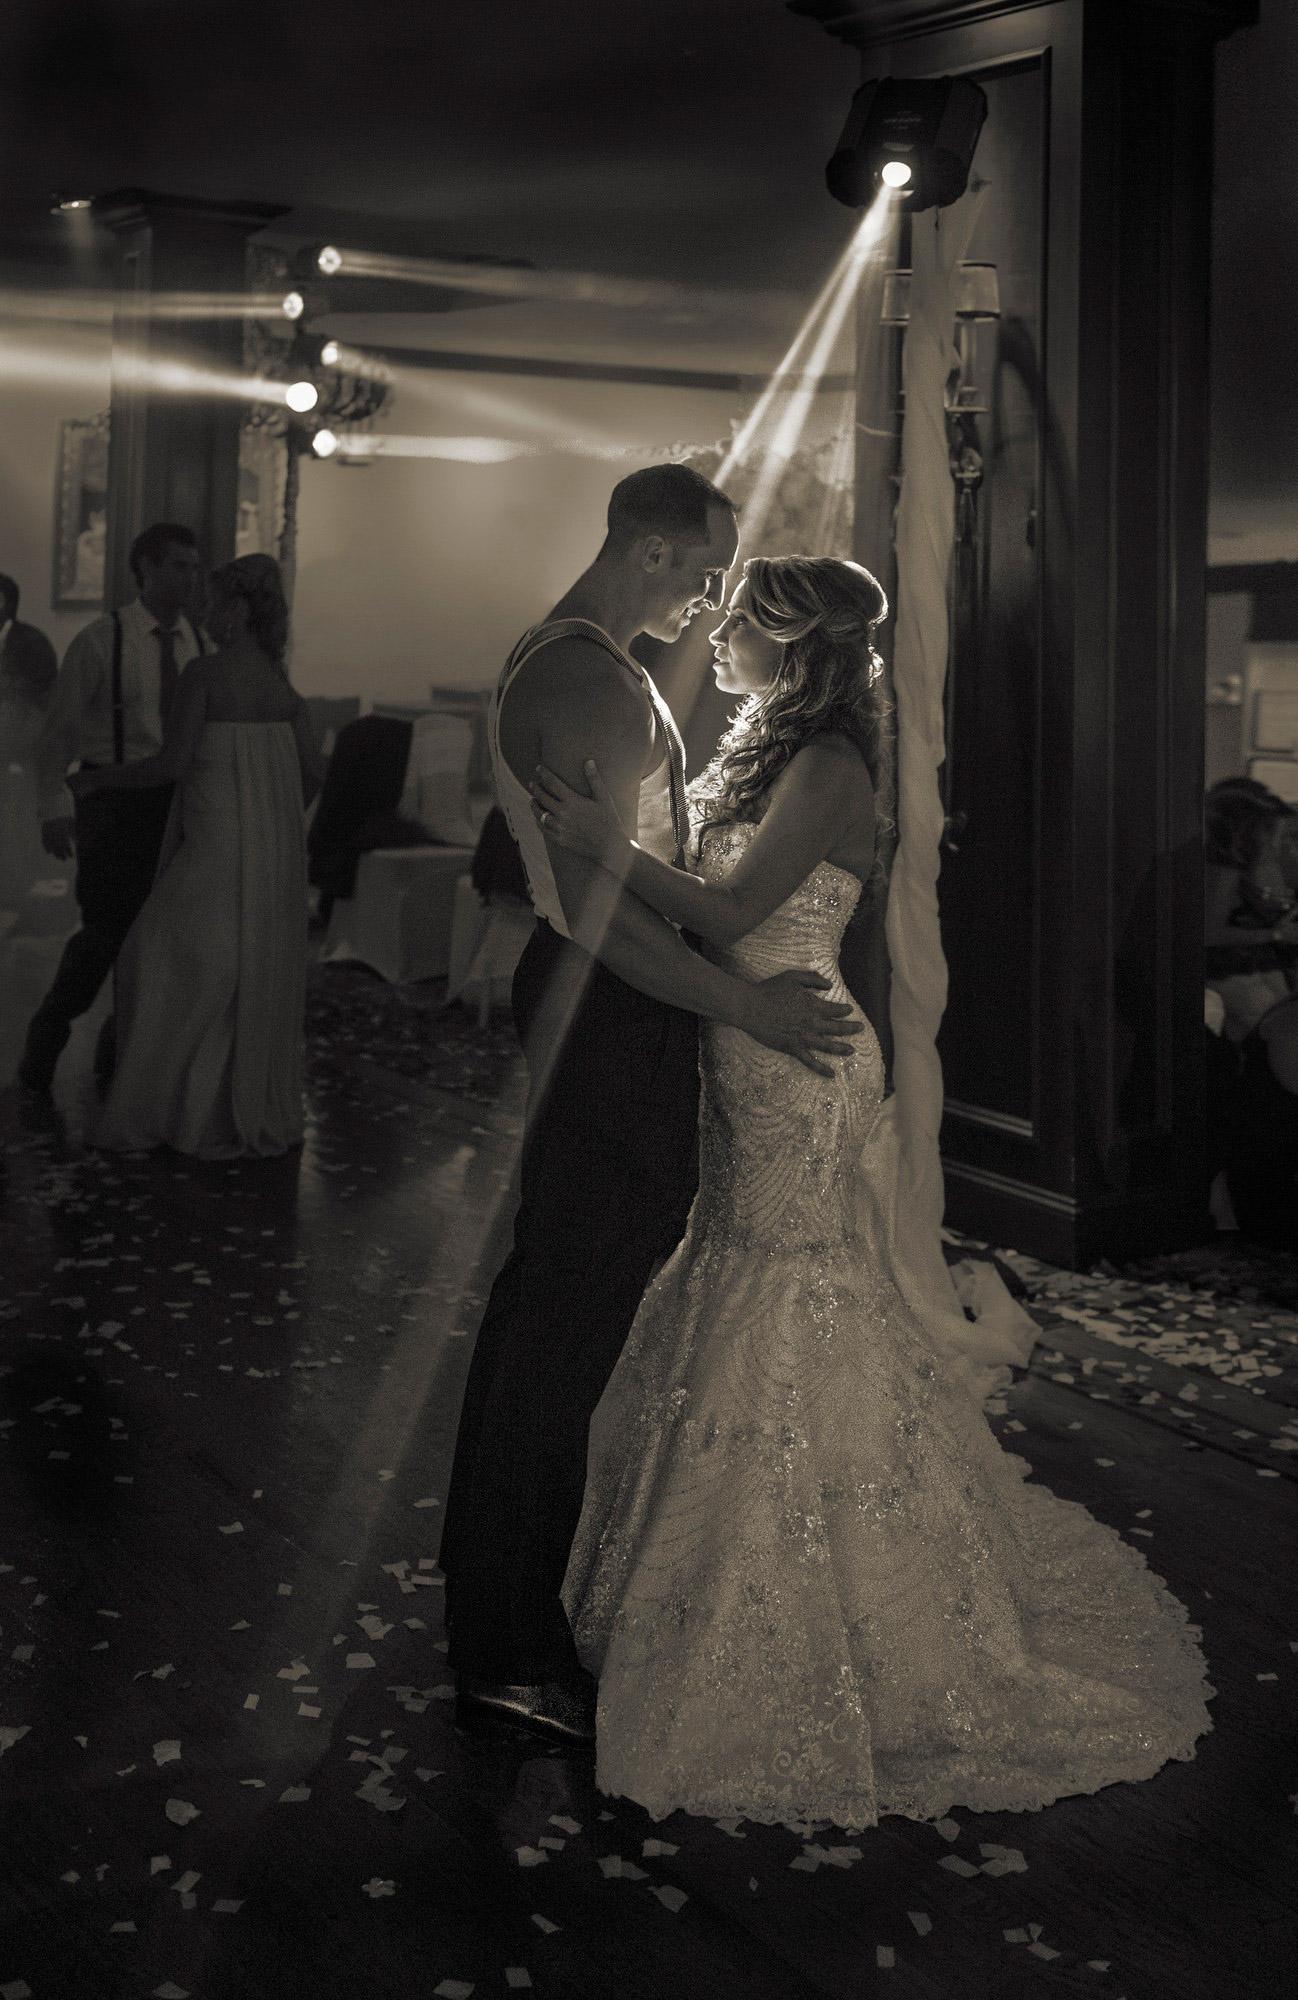 spotlit-bride-dances-with-shirtless-groom-in-suspenders-best-wedding-photos-jerry-ghionis-top-las-vegas-photographer